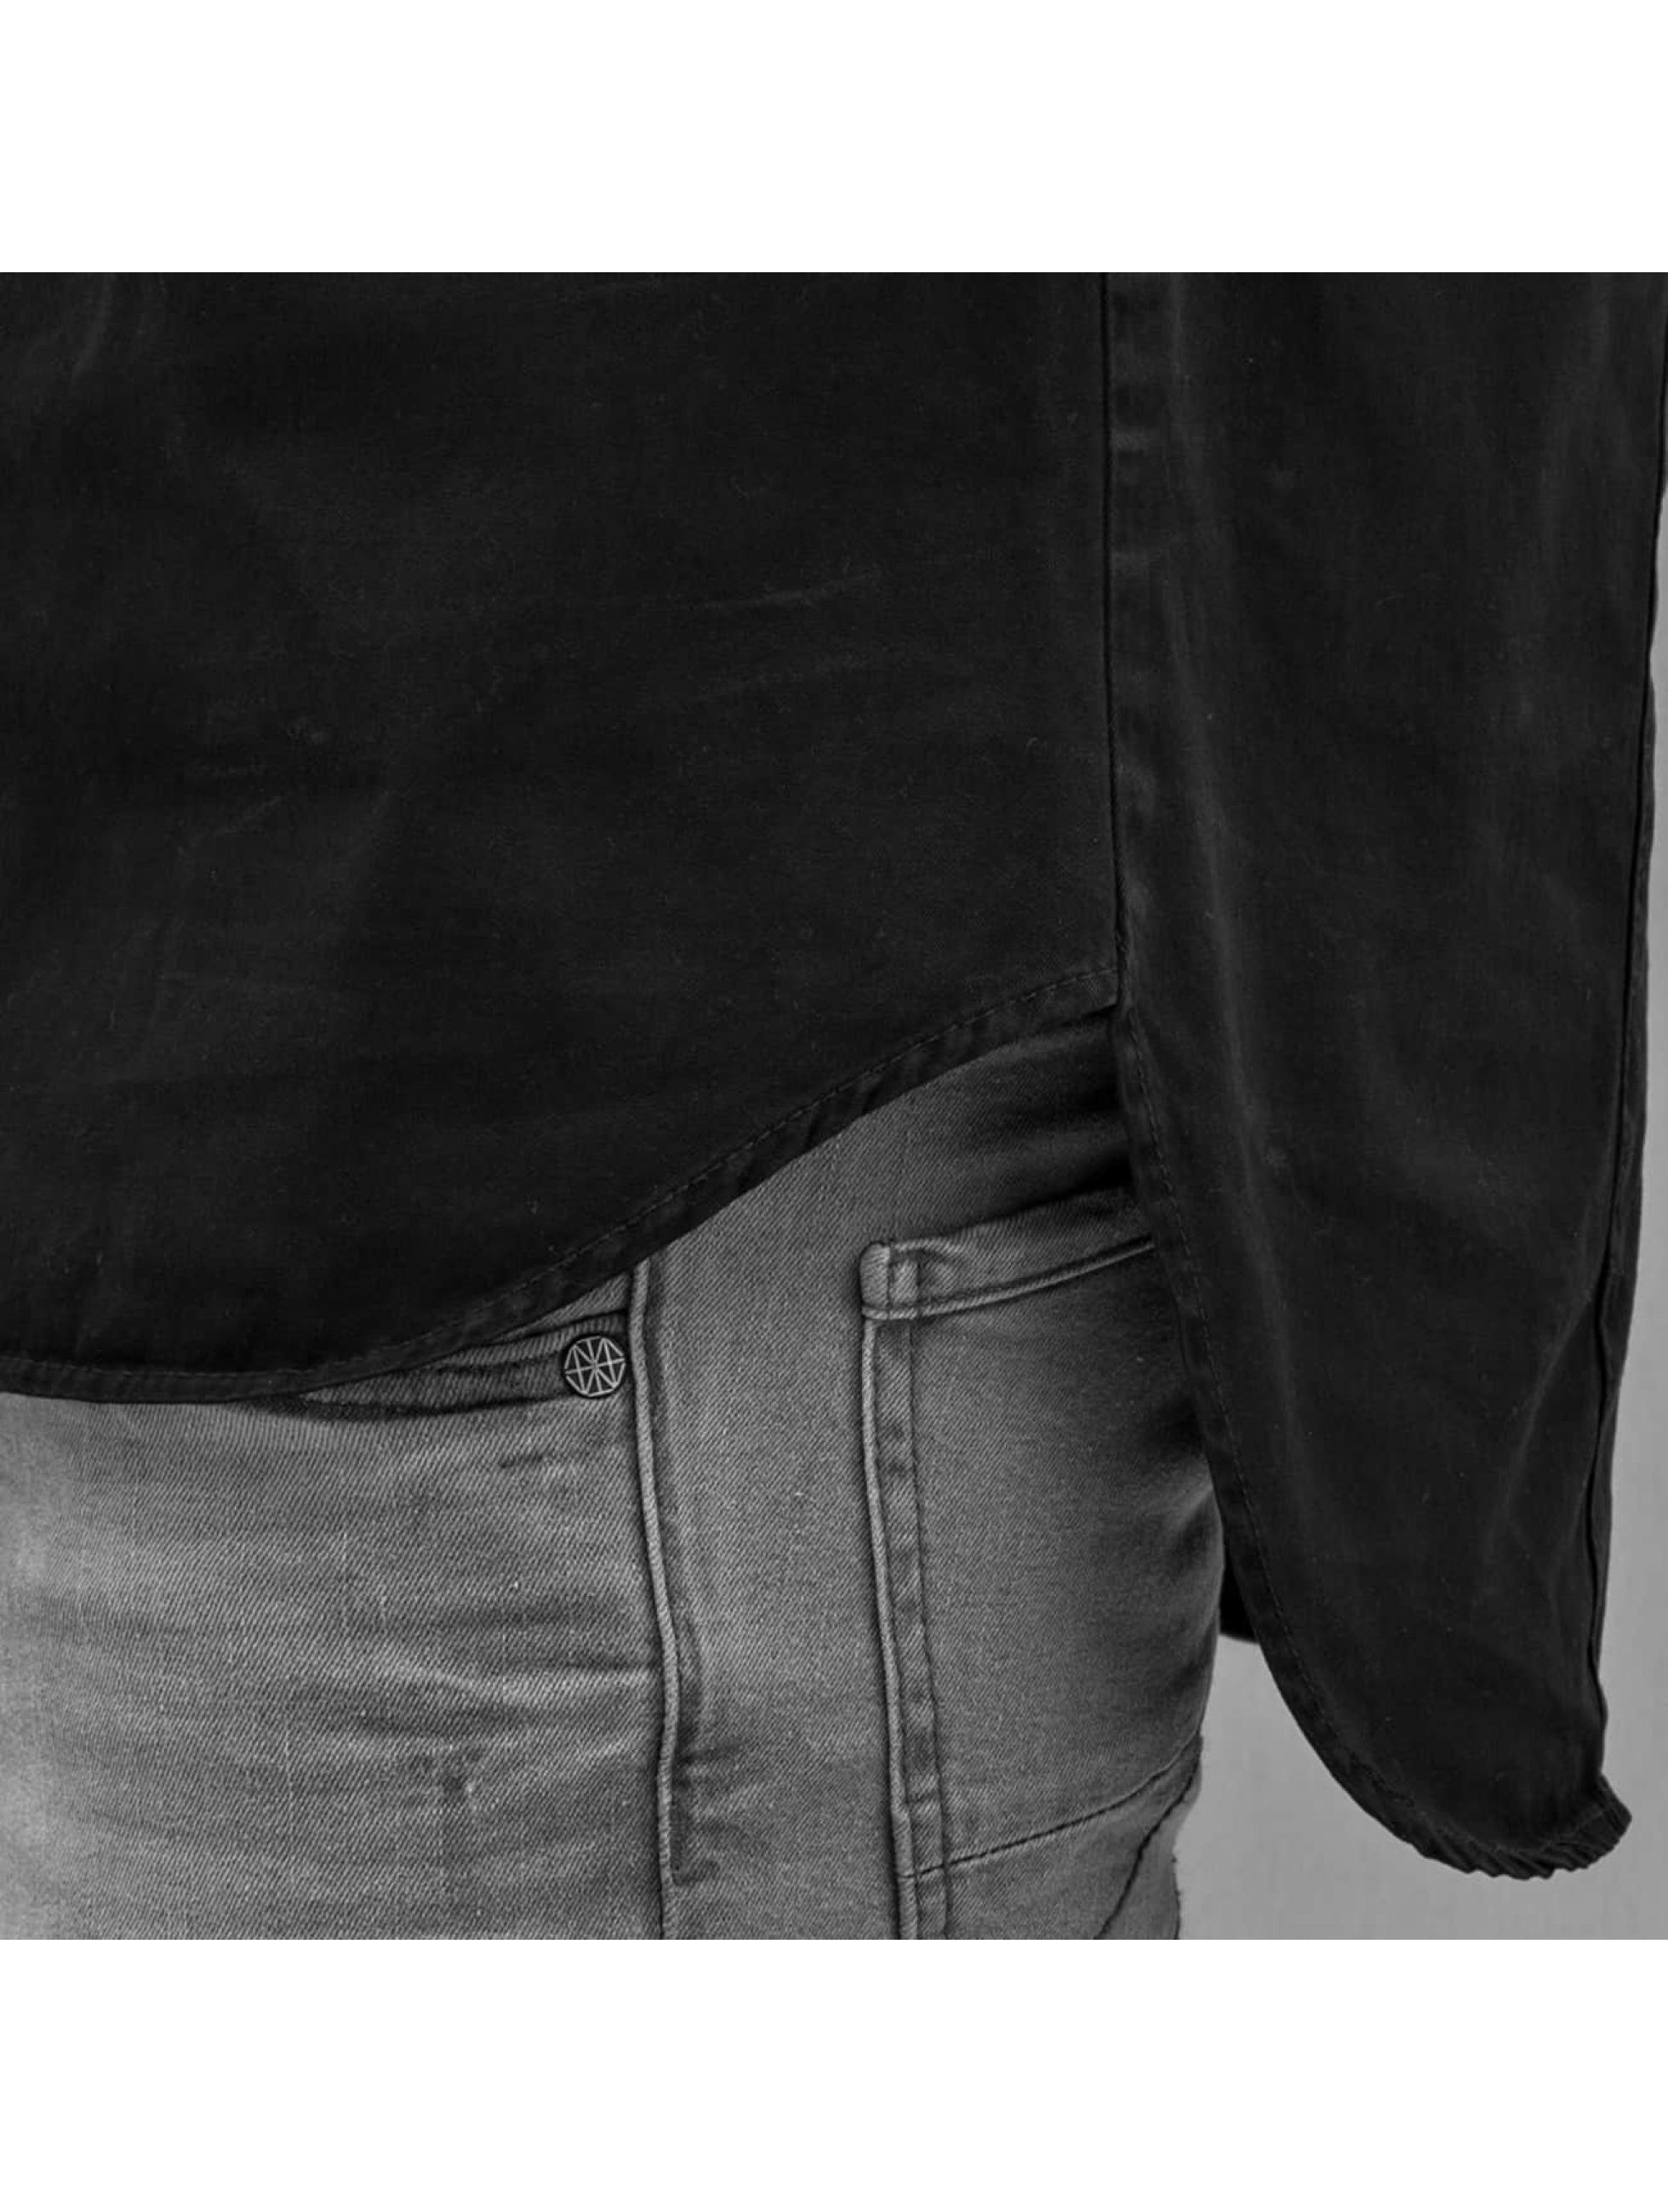 Amsterdenim Hemd Wim schwarz